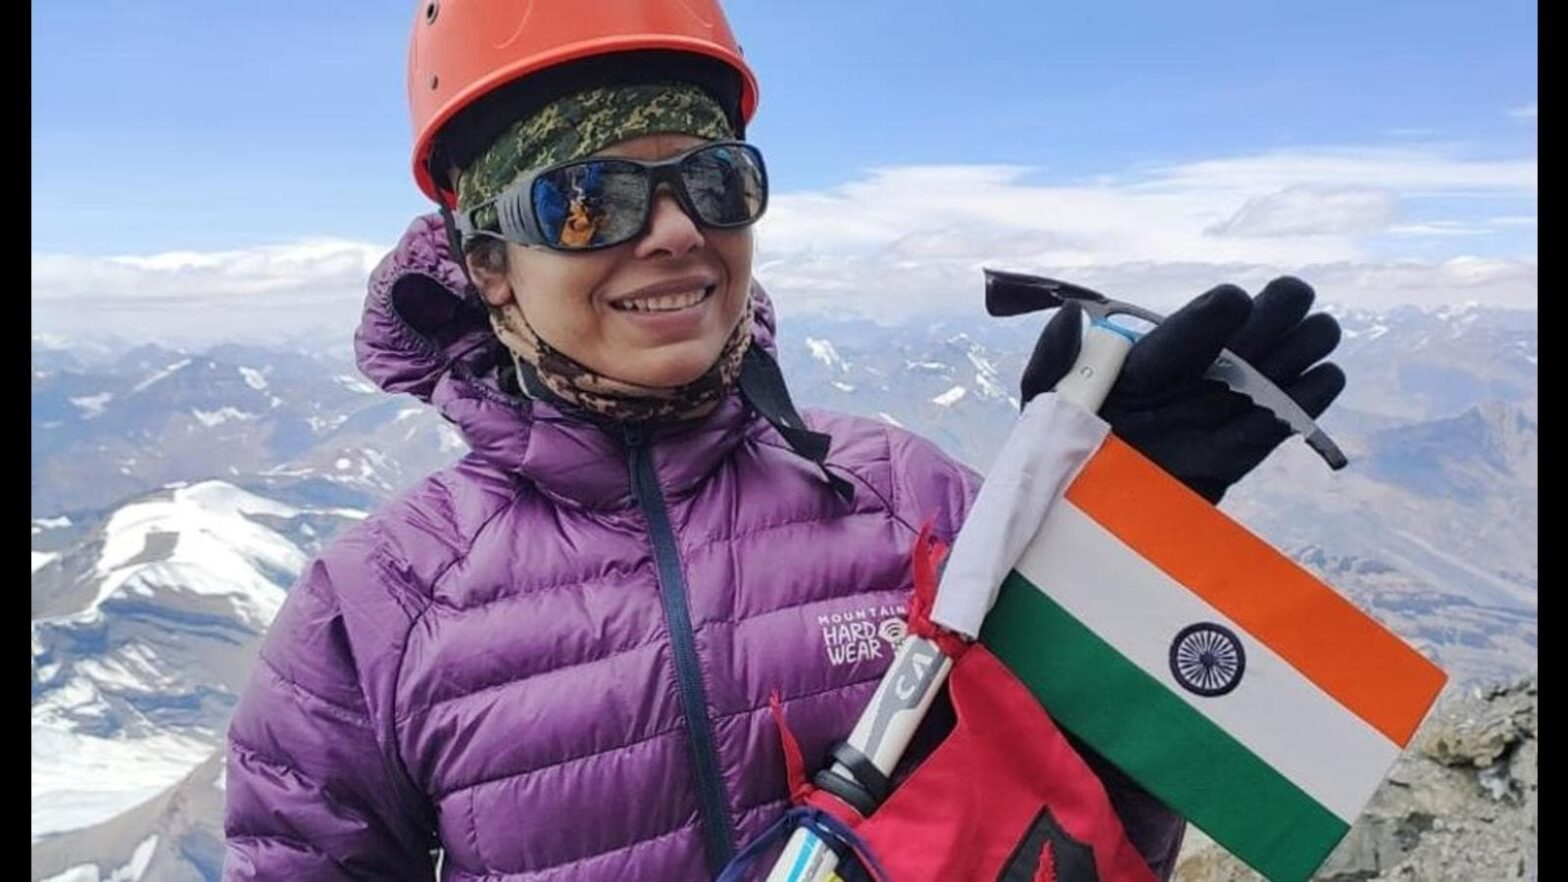 All-women team of three armed forces summits Mt Manirang in Himachal| മൂന്ന് സായുധ സേനകളടങ്ങിയ വനിതാ സംഘം ഹിമാചലിൽ എം.ടി മണിരാംഗ് ഉച്ചകോടി നടത്തുന്നു_40.1